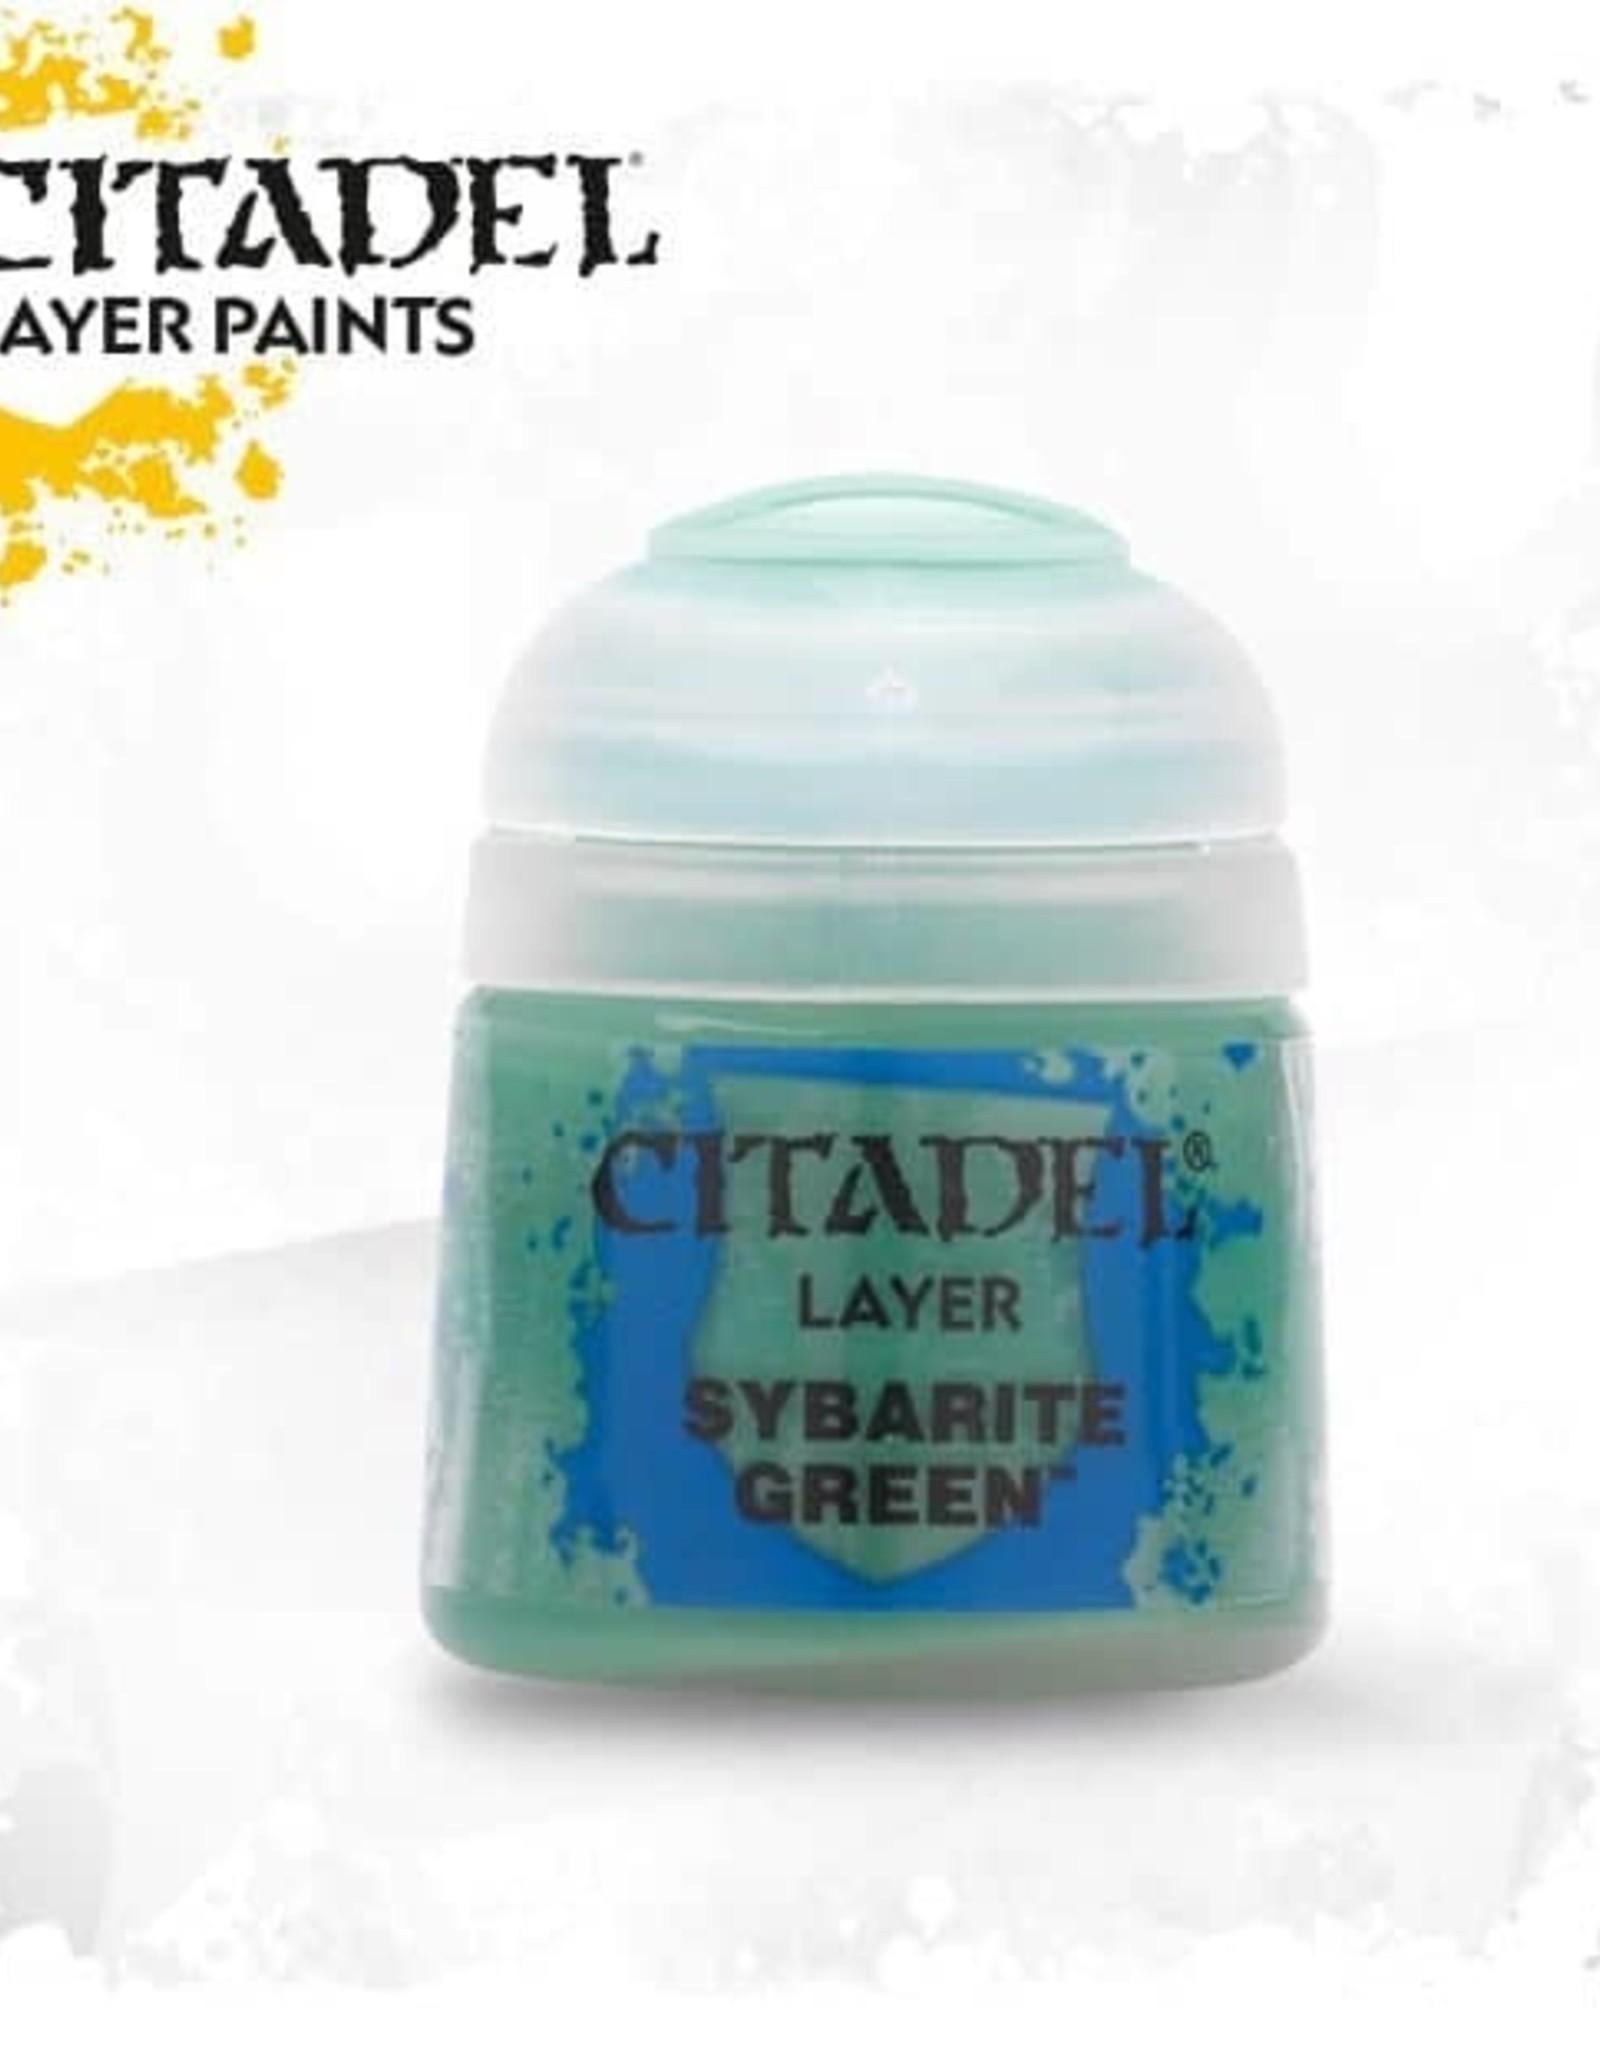 Games Workshop Citadel Paint: Layer - Sybarite Green